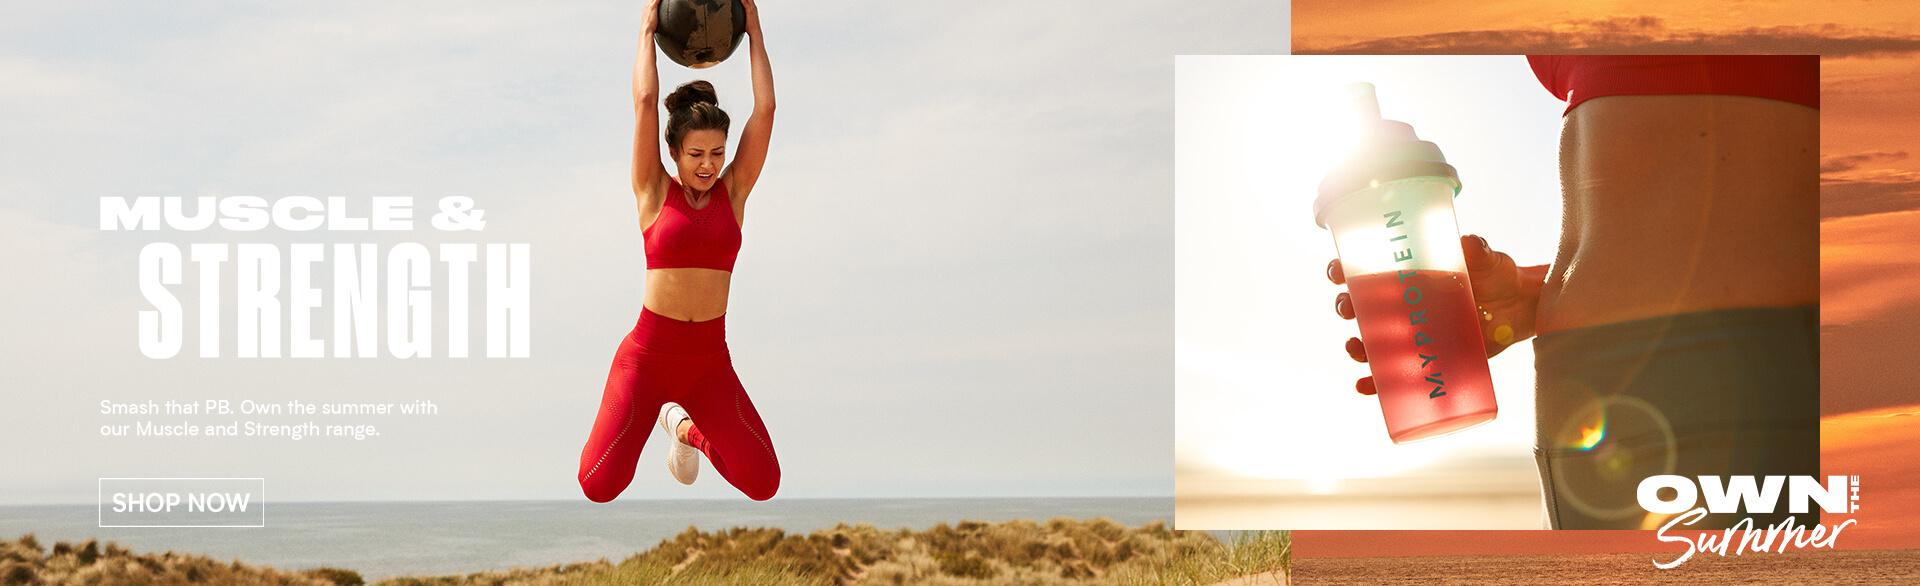 Myprotein Summer goals- muscle & strength banner